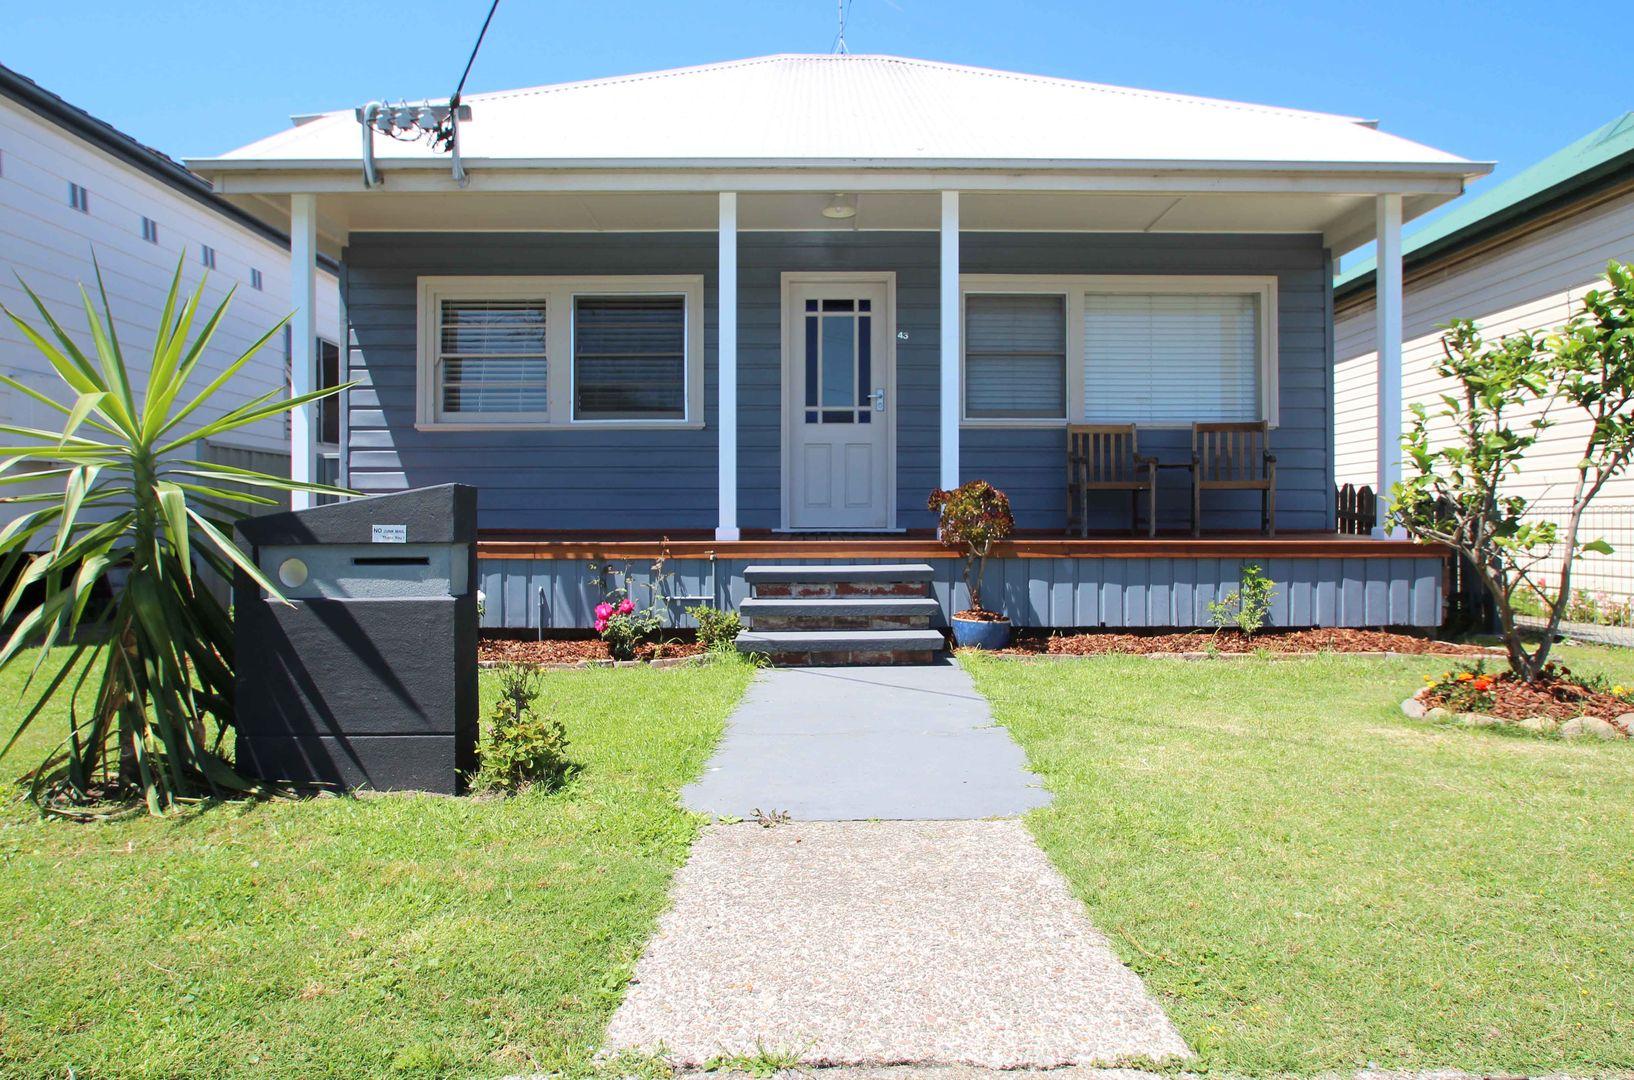 43 Teralba Road, Broadmeadow NSW 2292, Image 0